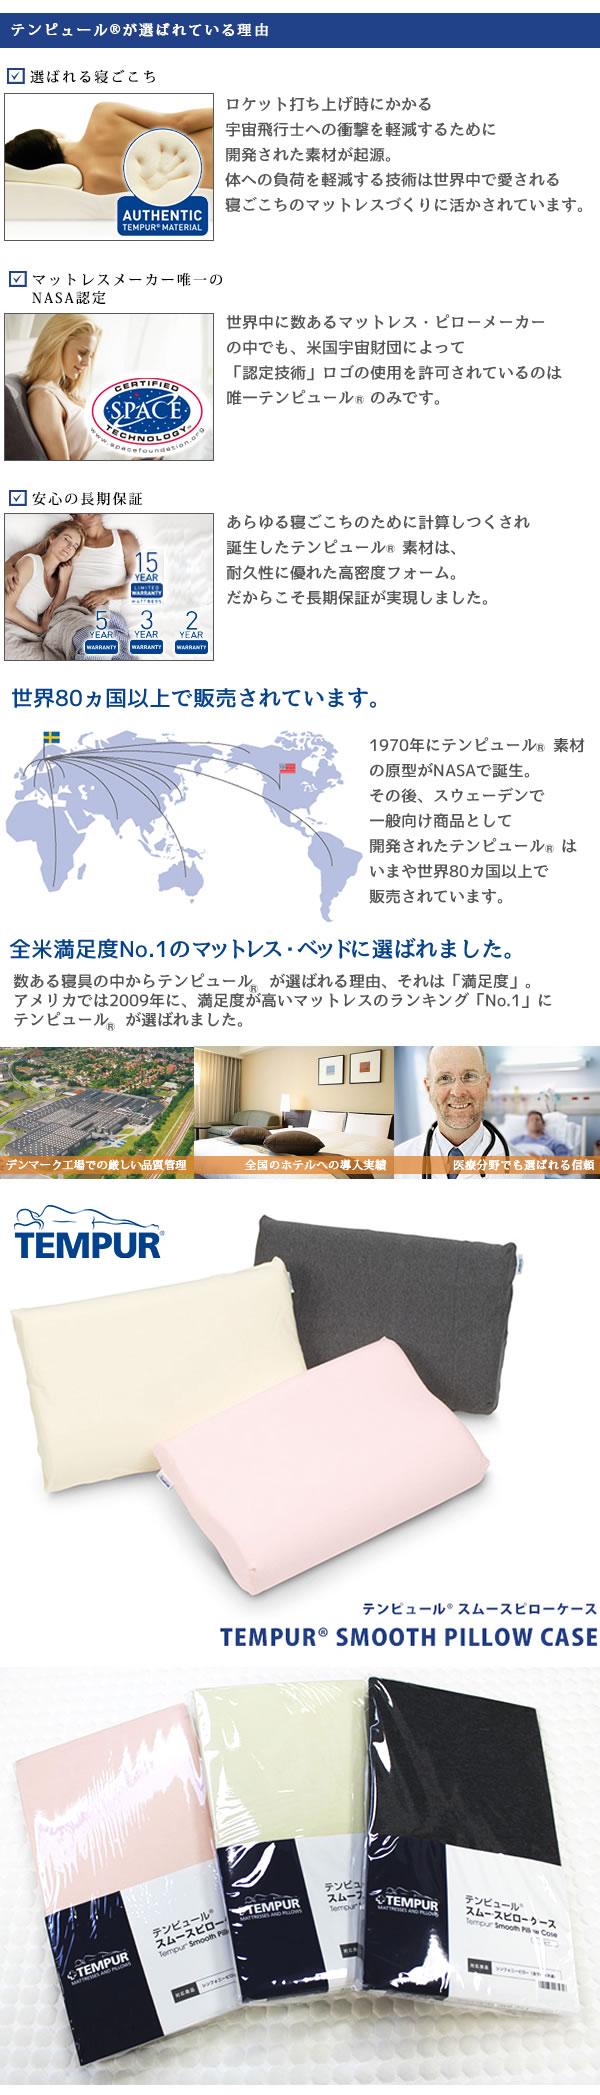 TEMPUR テンピュール スムースピロケース(ソナタピロー対応)